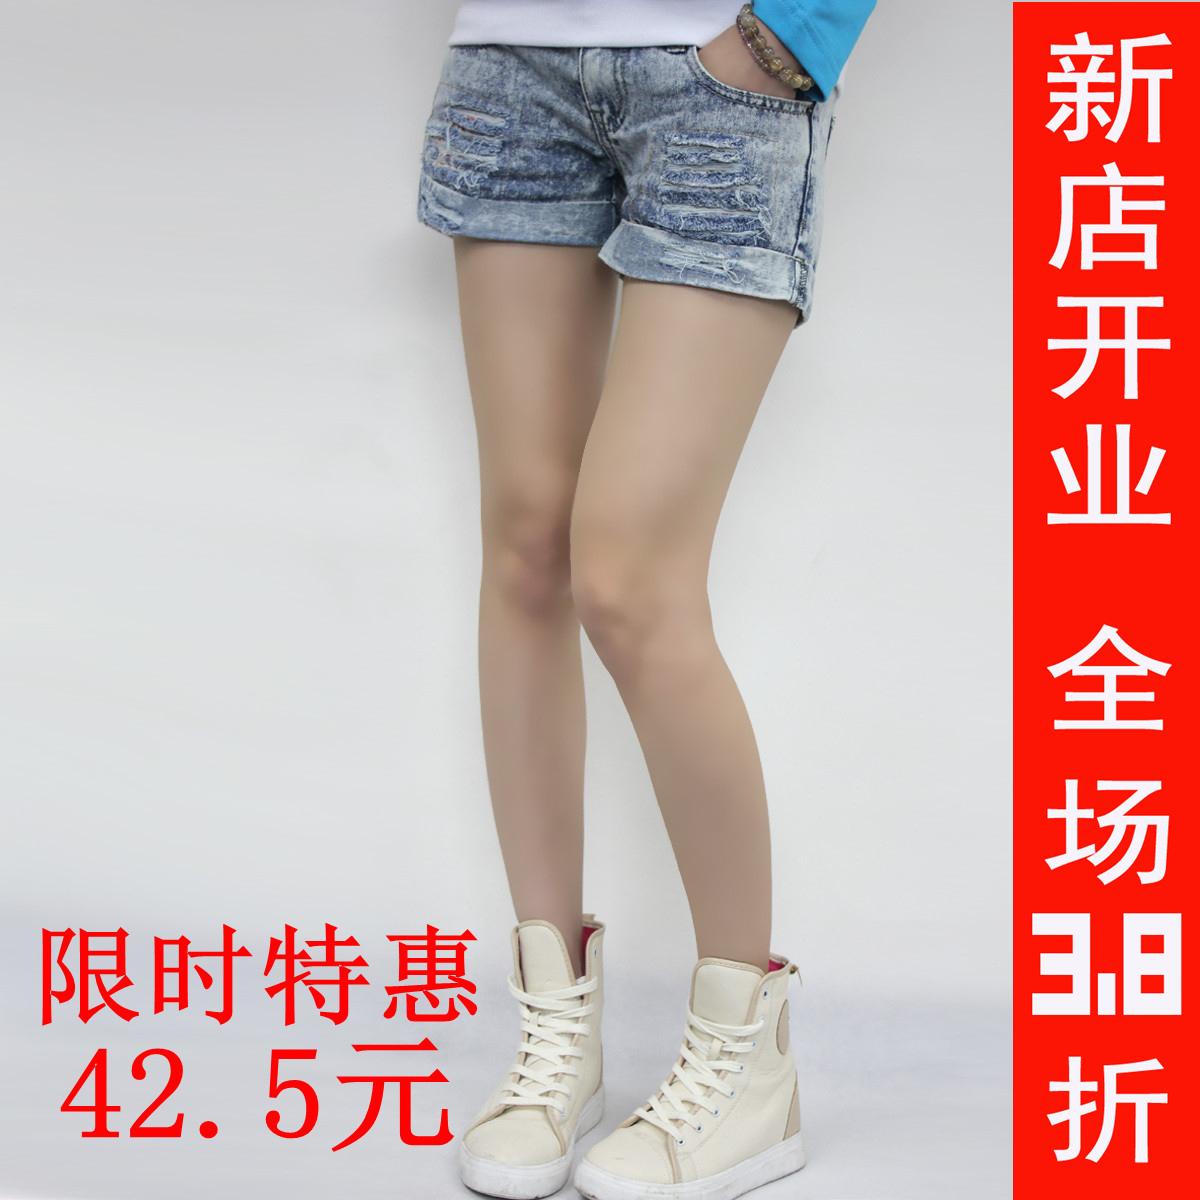 Женские брюки Clothing such as silk 32106 Шорты, мини-шорты Другая форма брюк